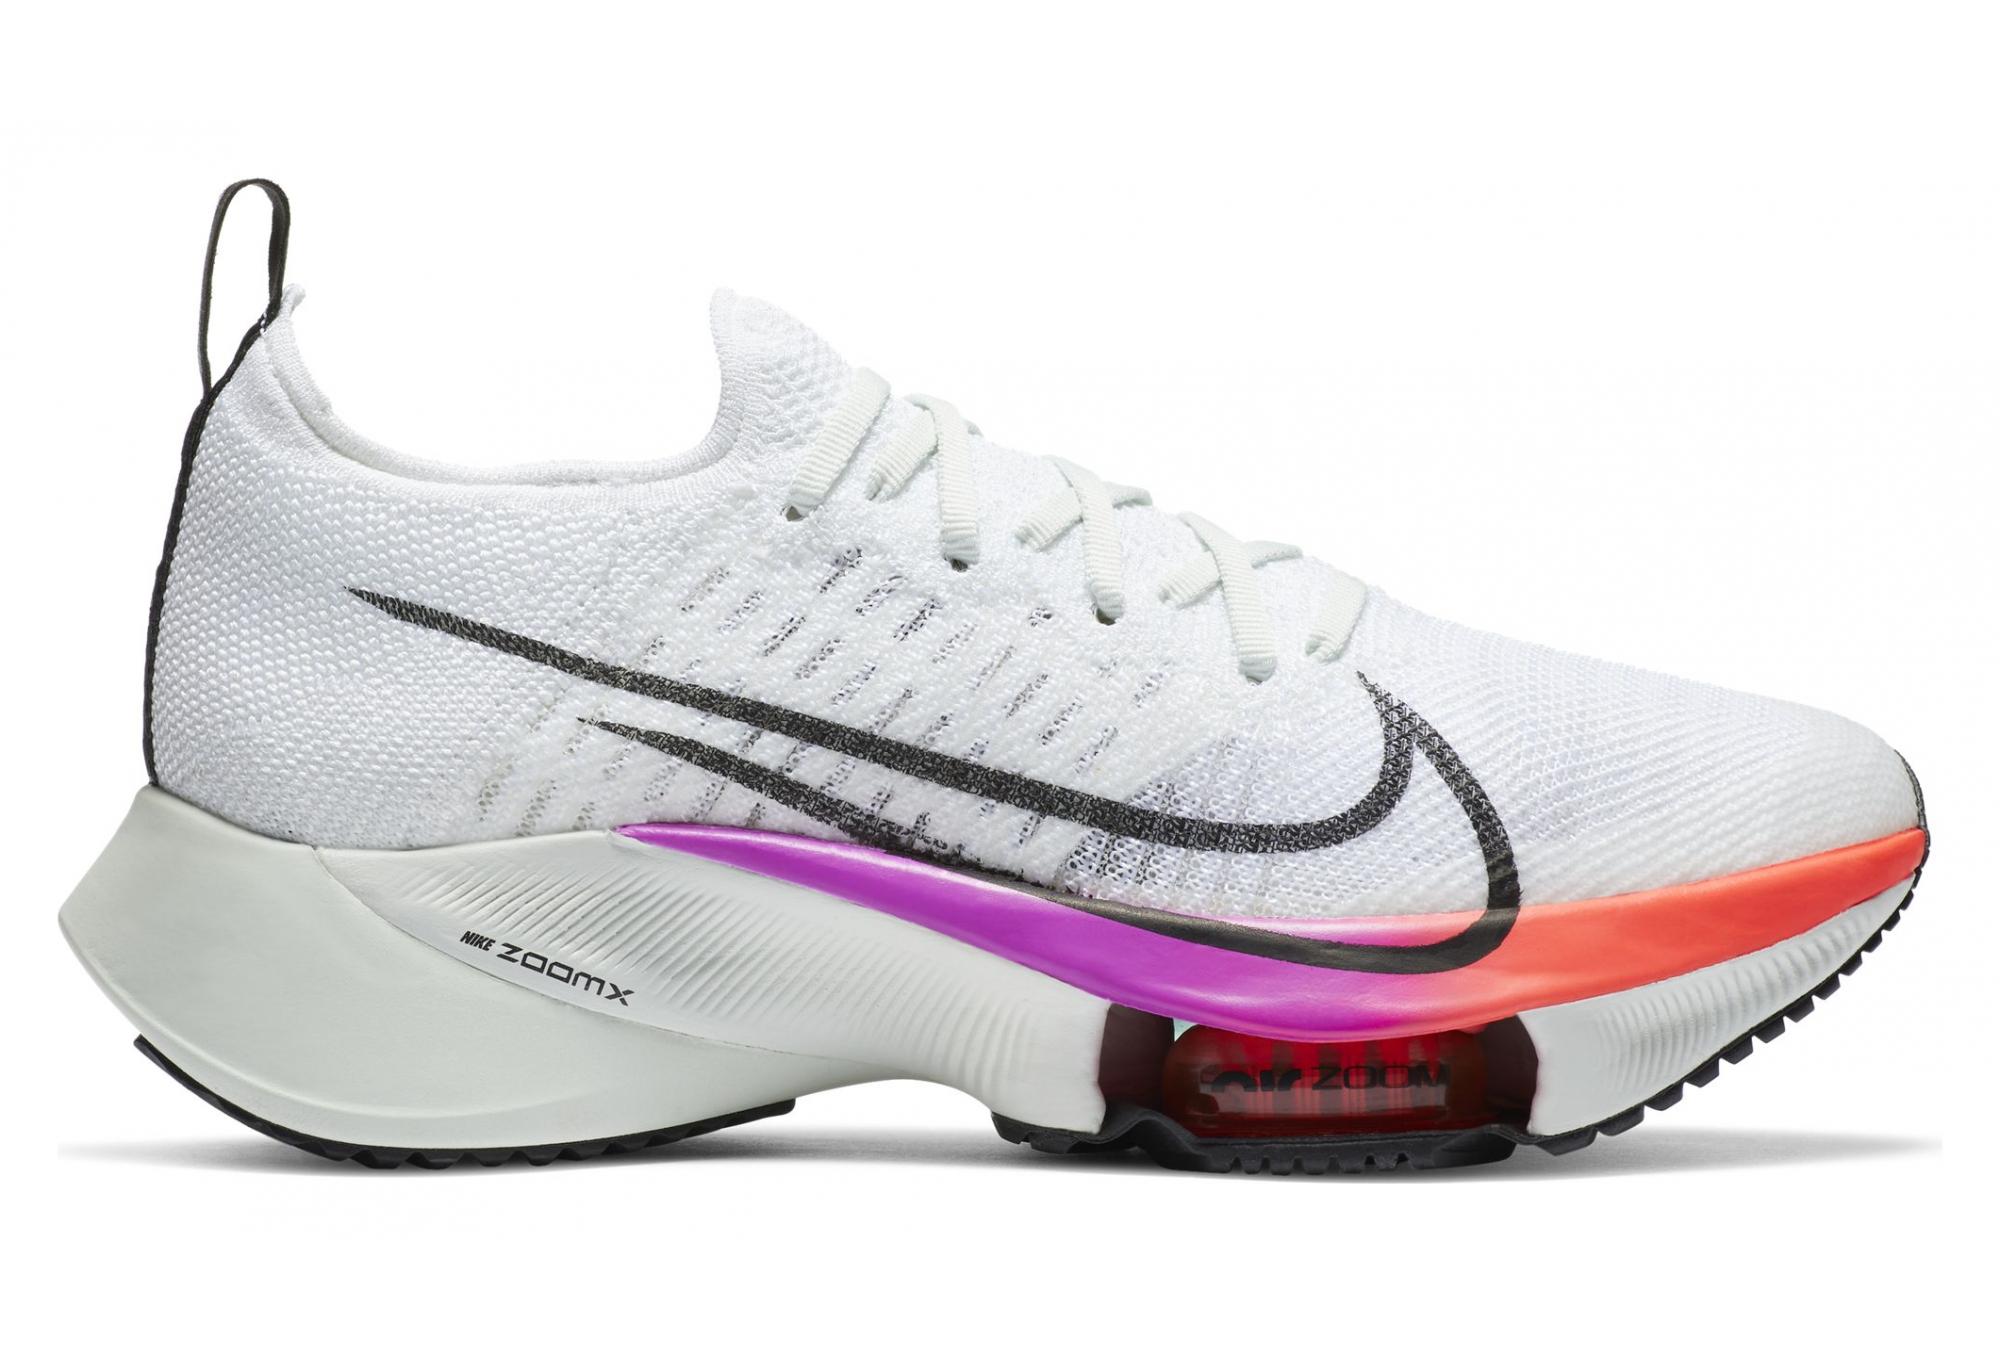 Chaussures de Running Femme Nike Air Zoom Tempo Next% Blanc ...